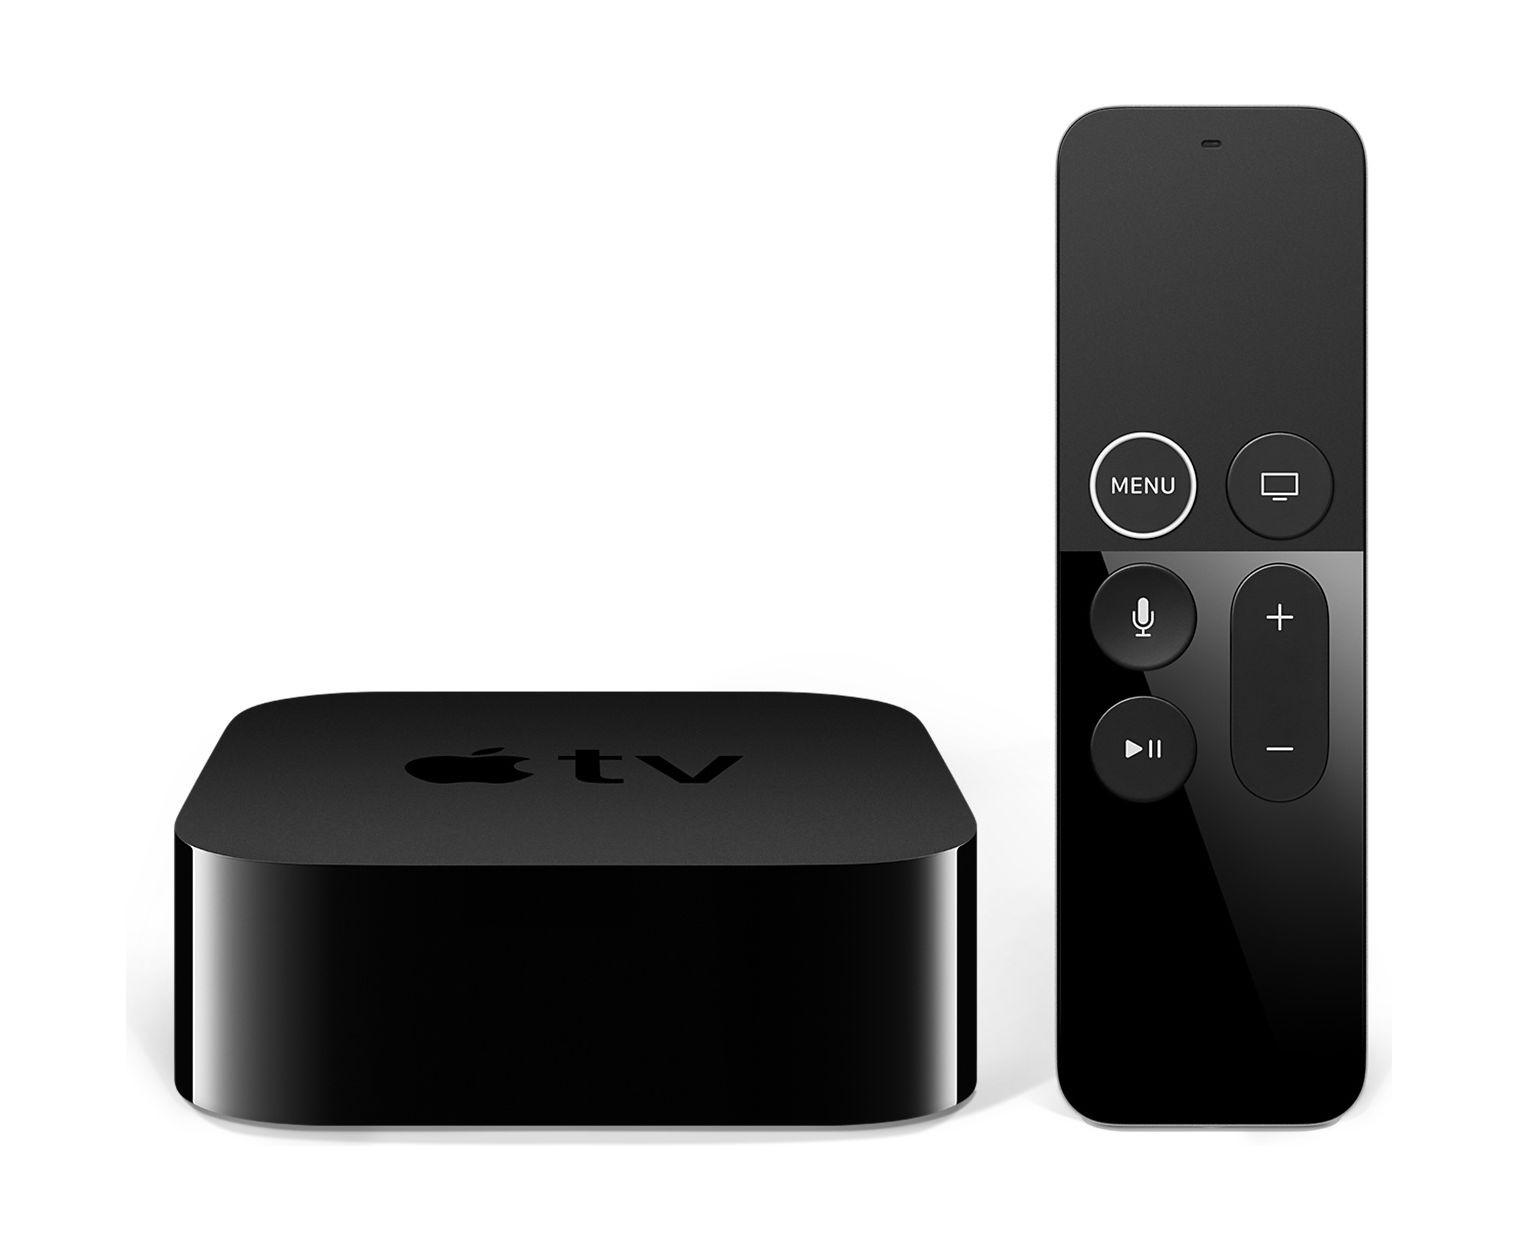 Apple Apple TV 4K 32GB (latest model) Black MQD22LL/A ...